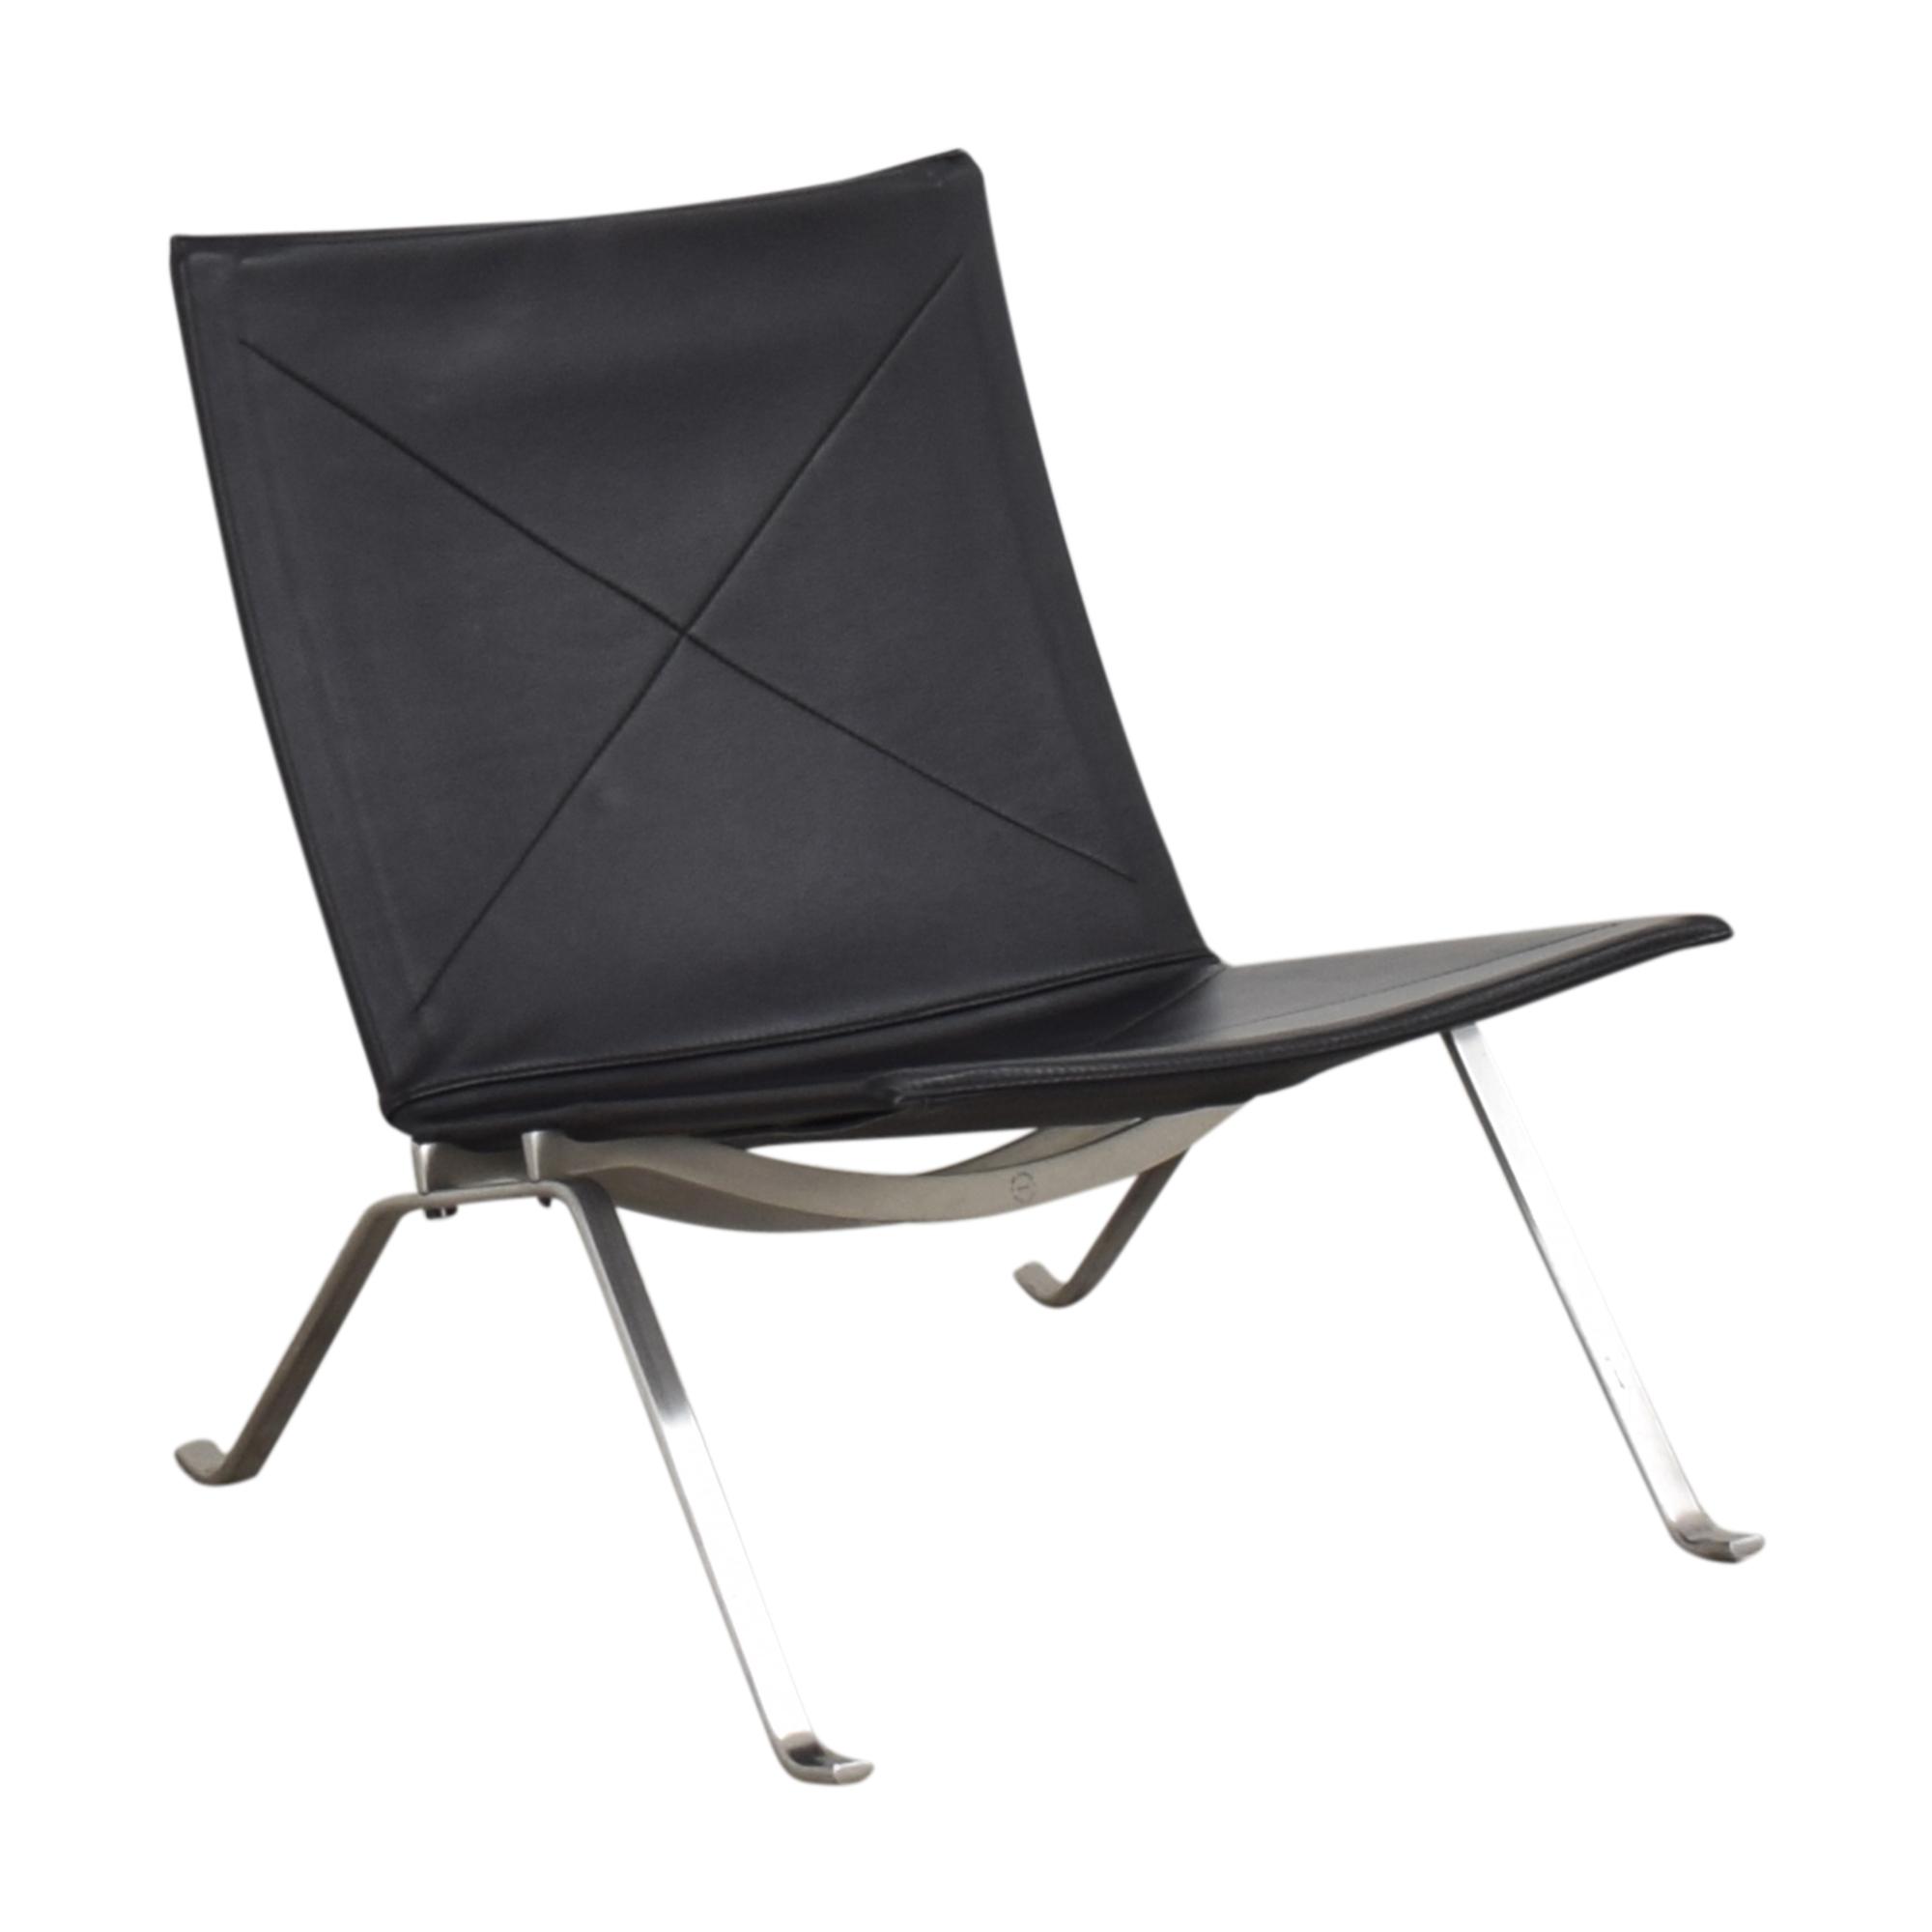 Fritz Hansen Poul Kjaerholm PK22 Modern Chair / Accent Chairs